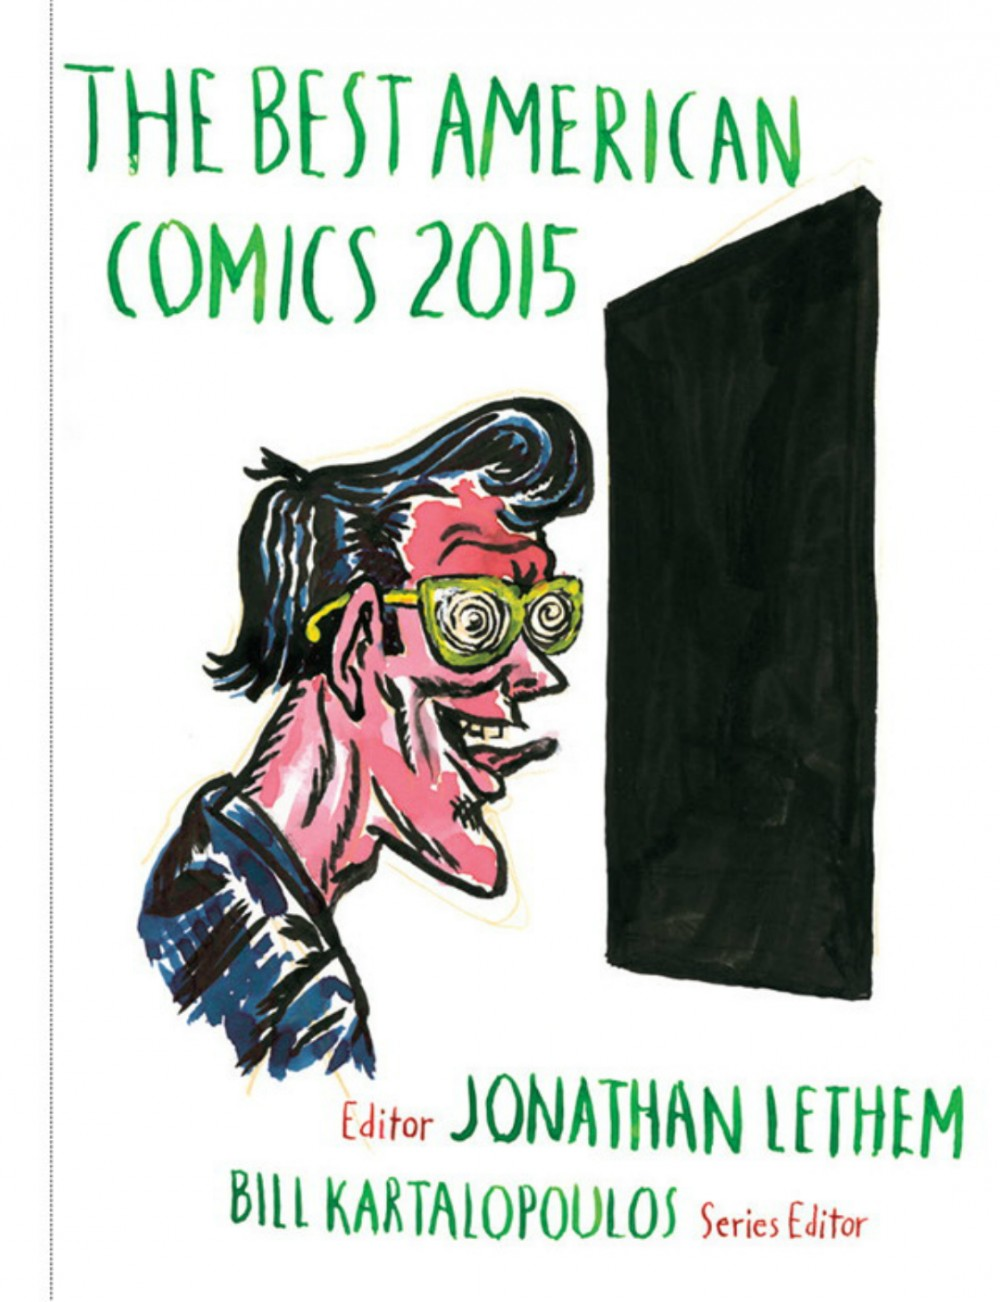 The Best American Comics 2015 será editada por Jonathan Lethem